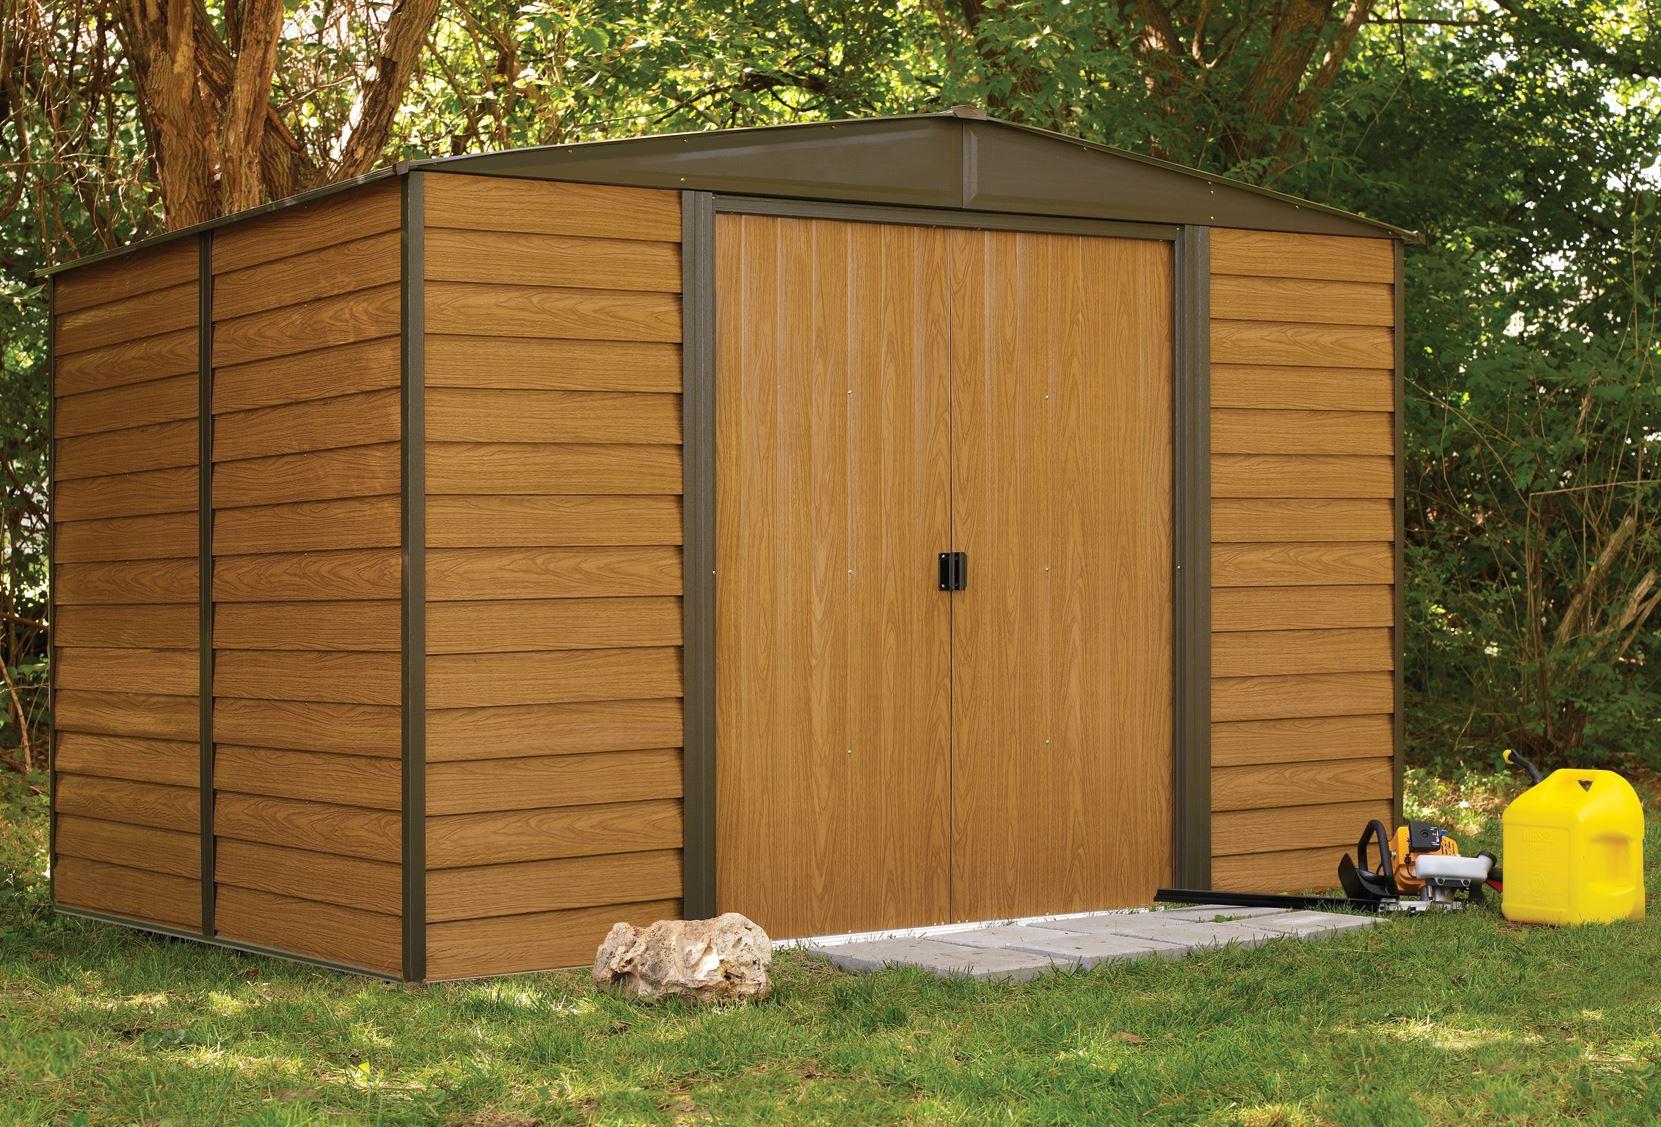 Galvanized Steel Garden Shed Imitation Wood Wr108 Ed108 avec Abri Jardin 4M2